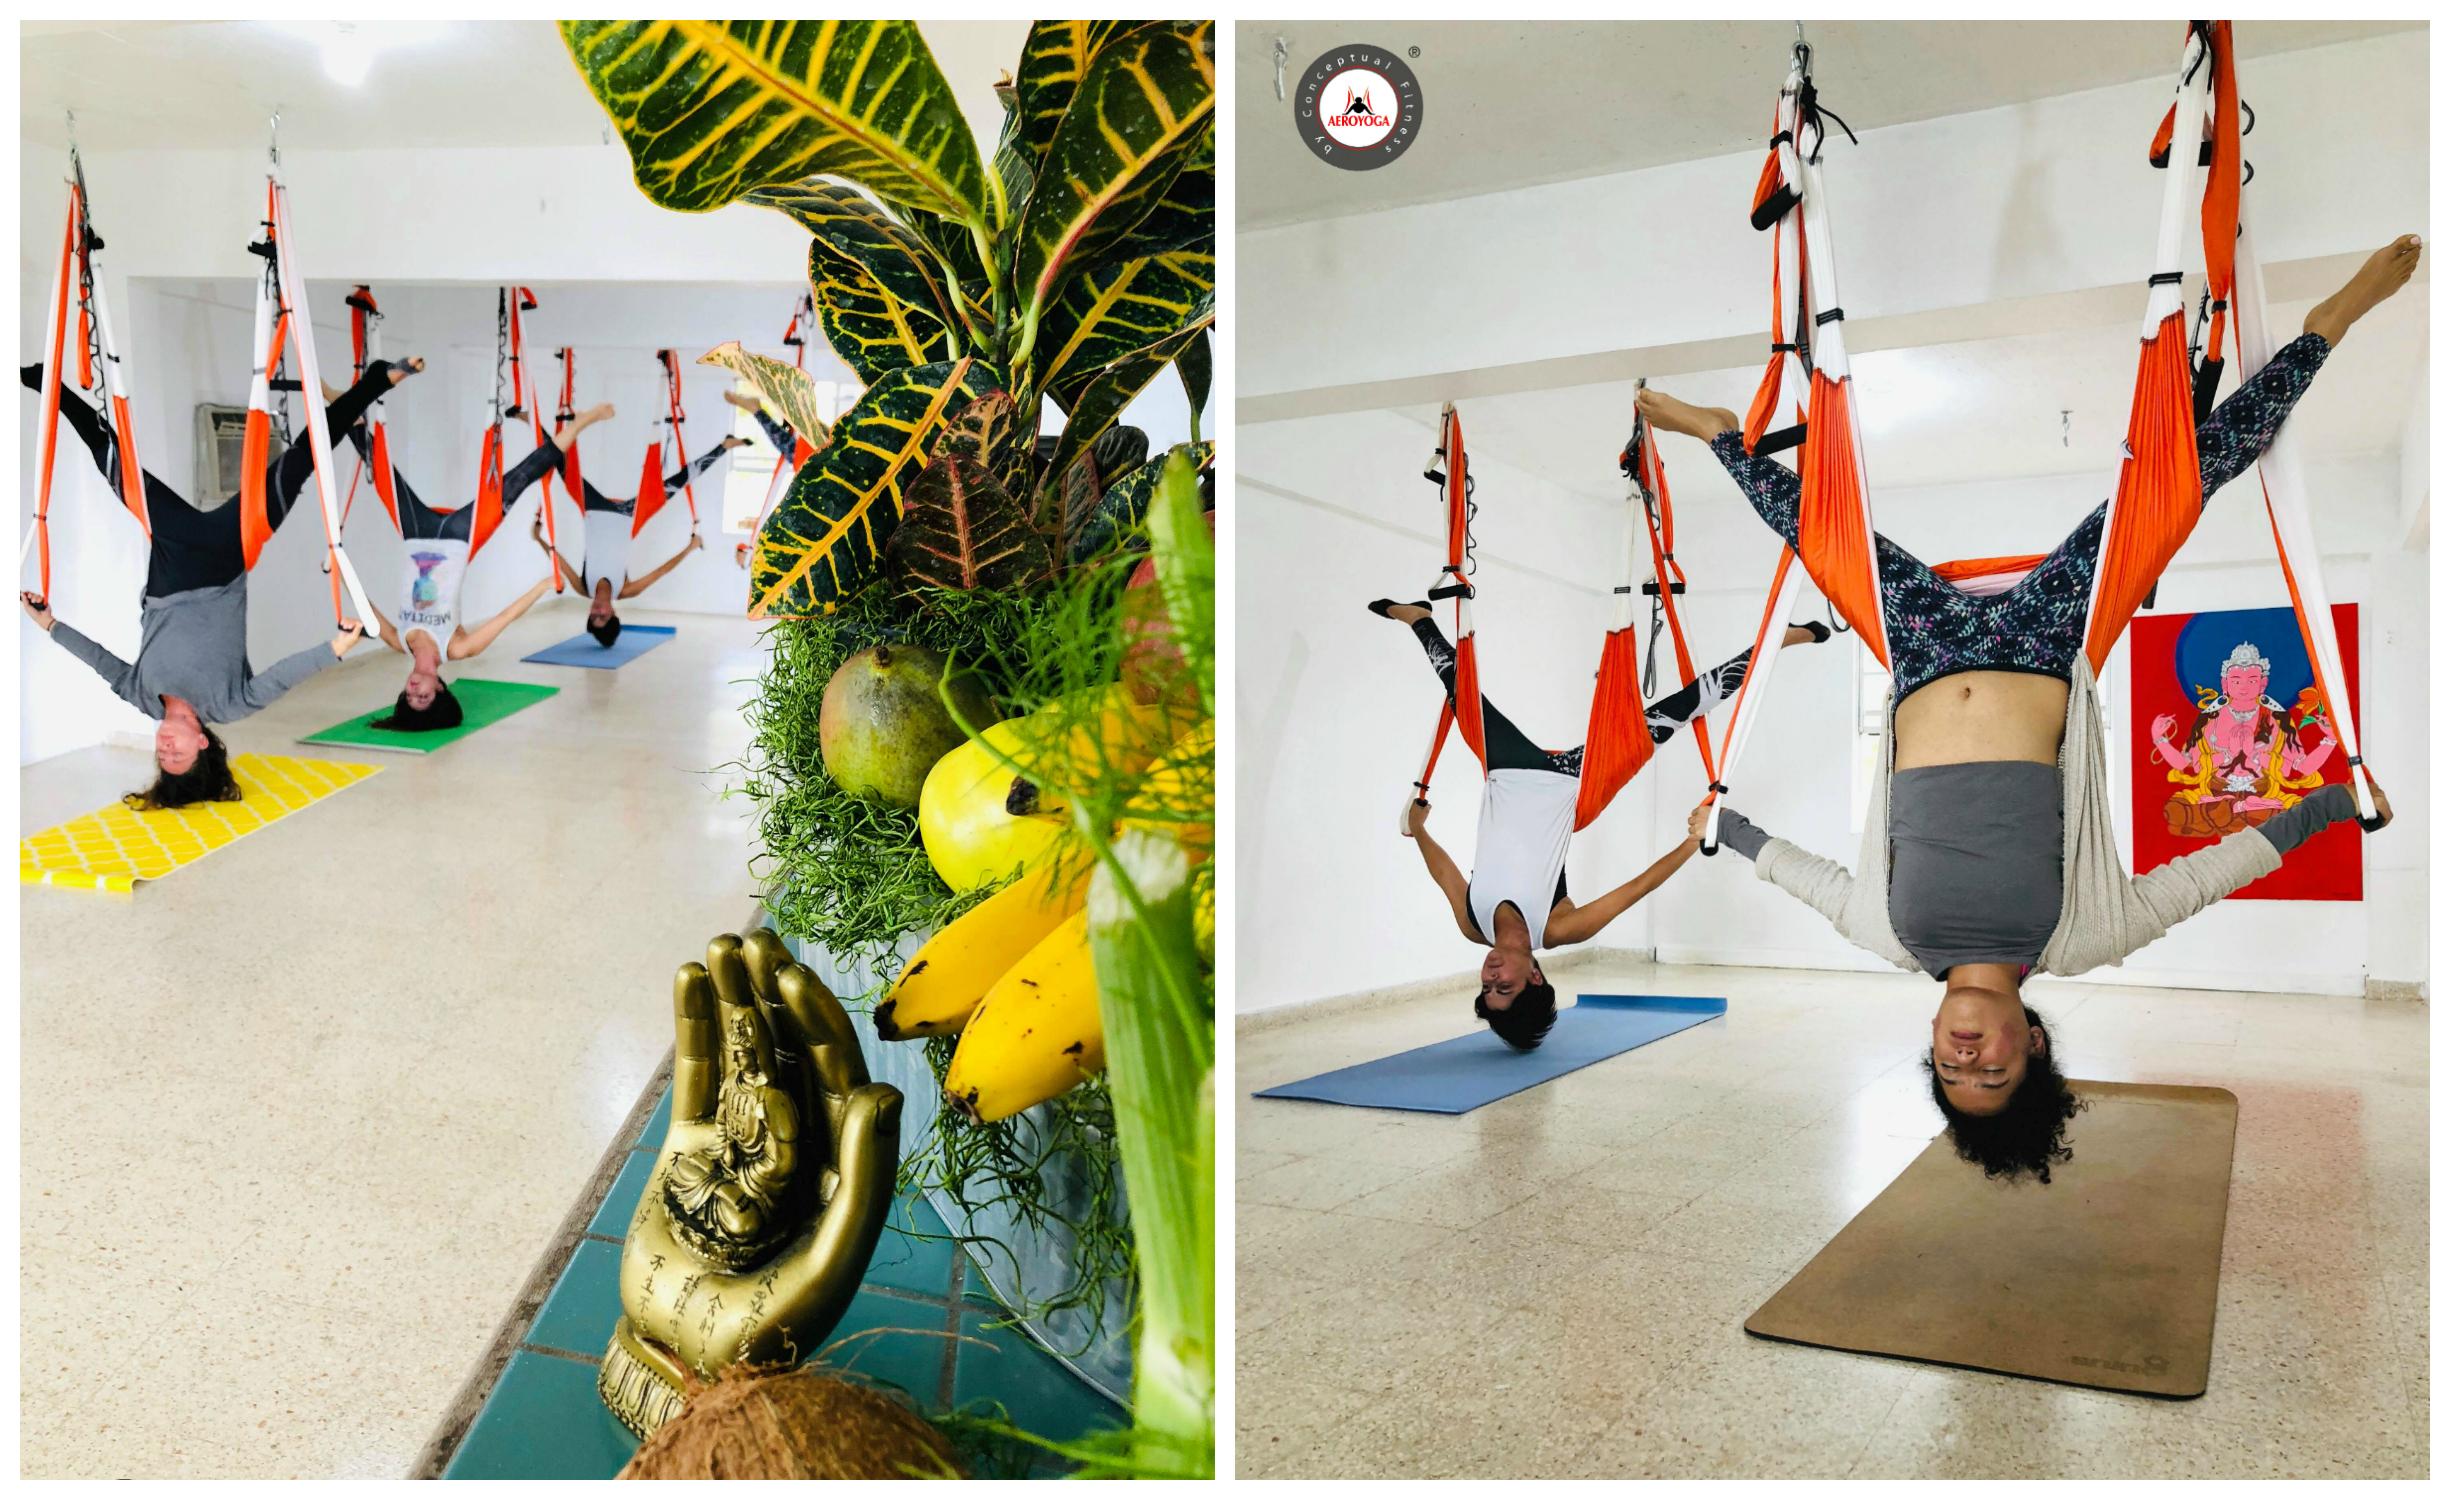 Aerial Yoga Teacher Training, Inaugurado el Nuevo AeroYoga ® Institute Puerto Rico, Fly!